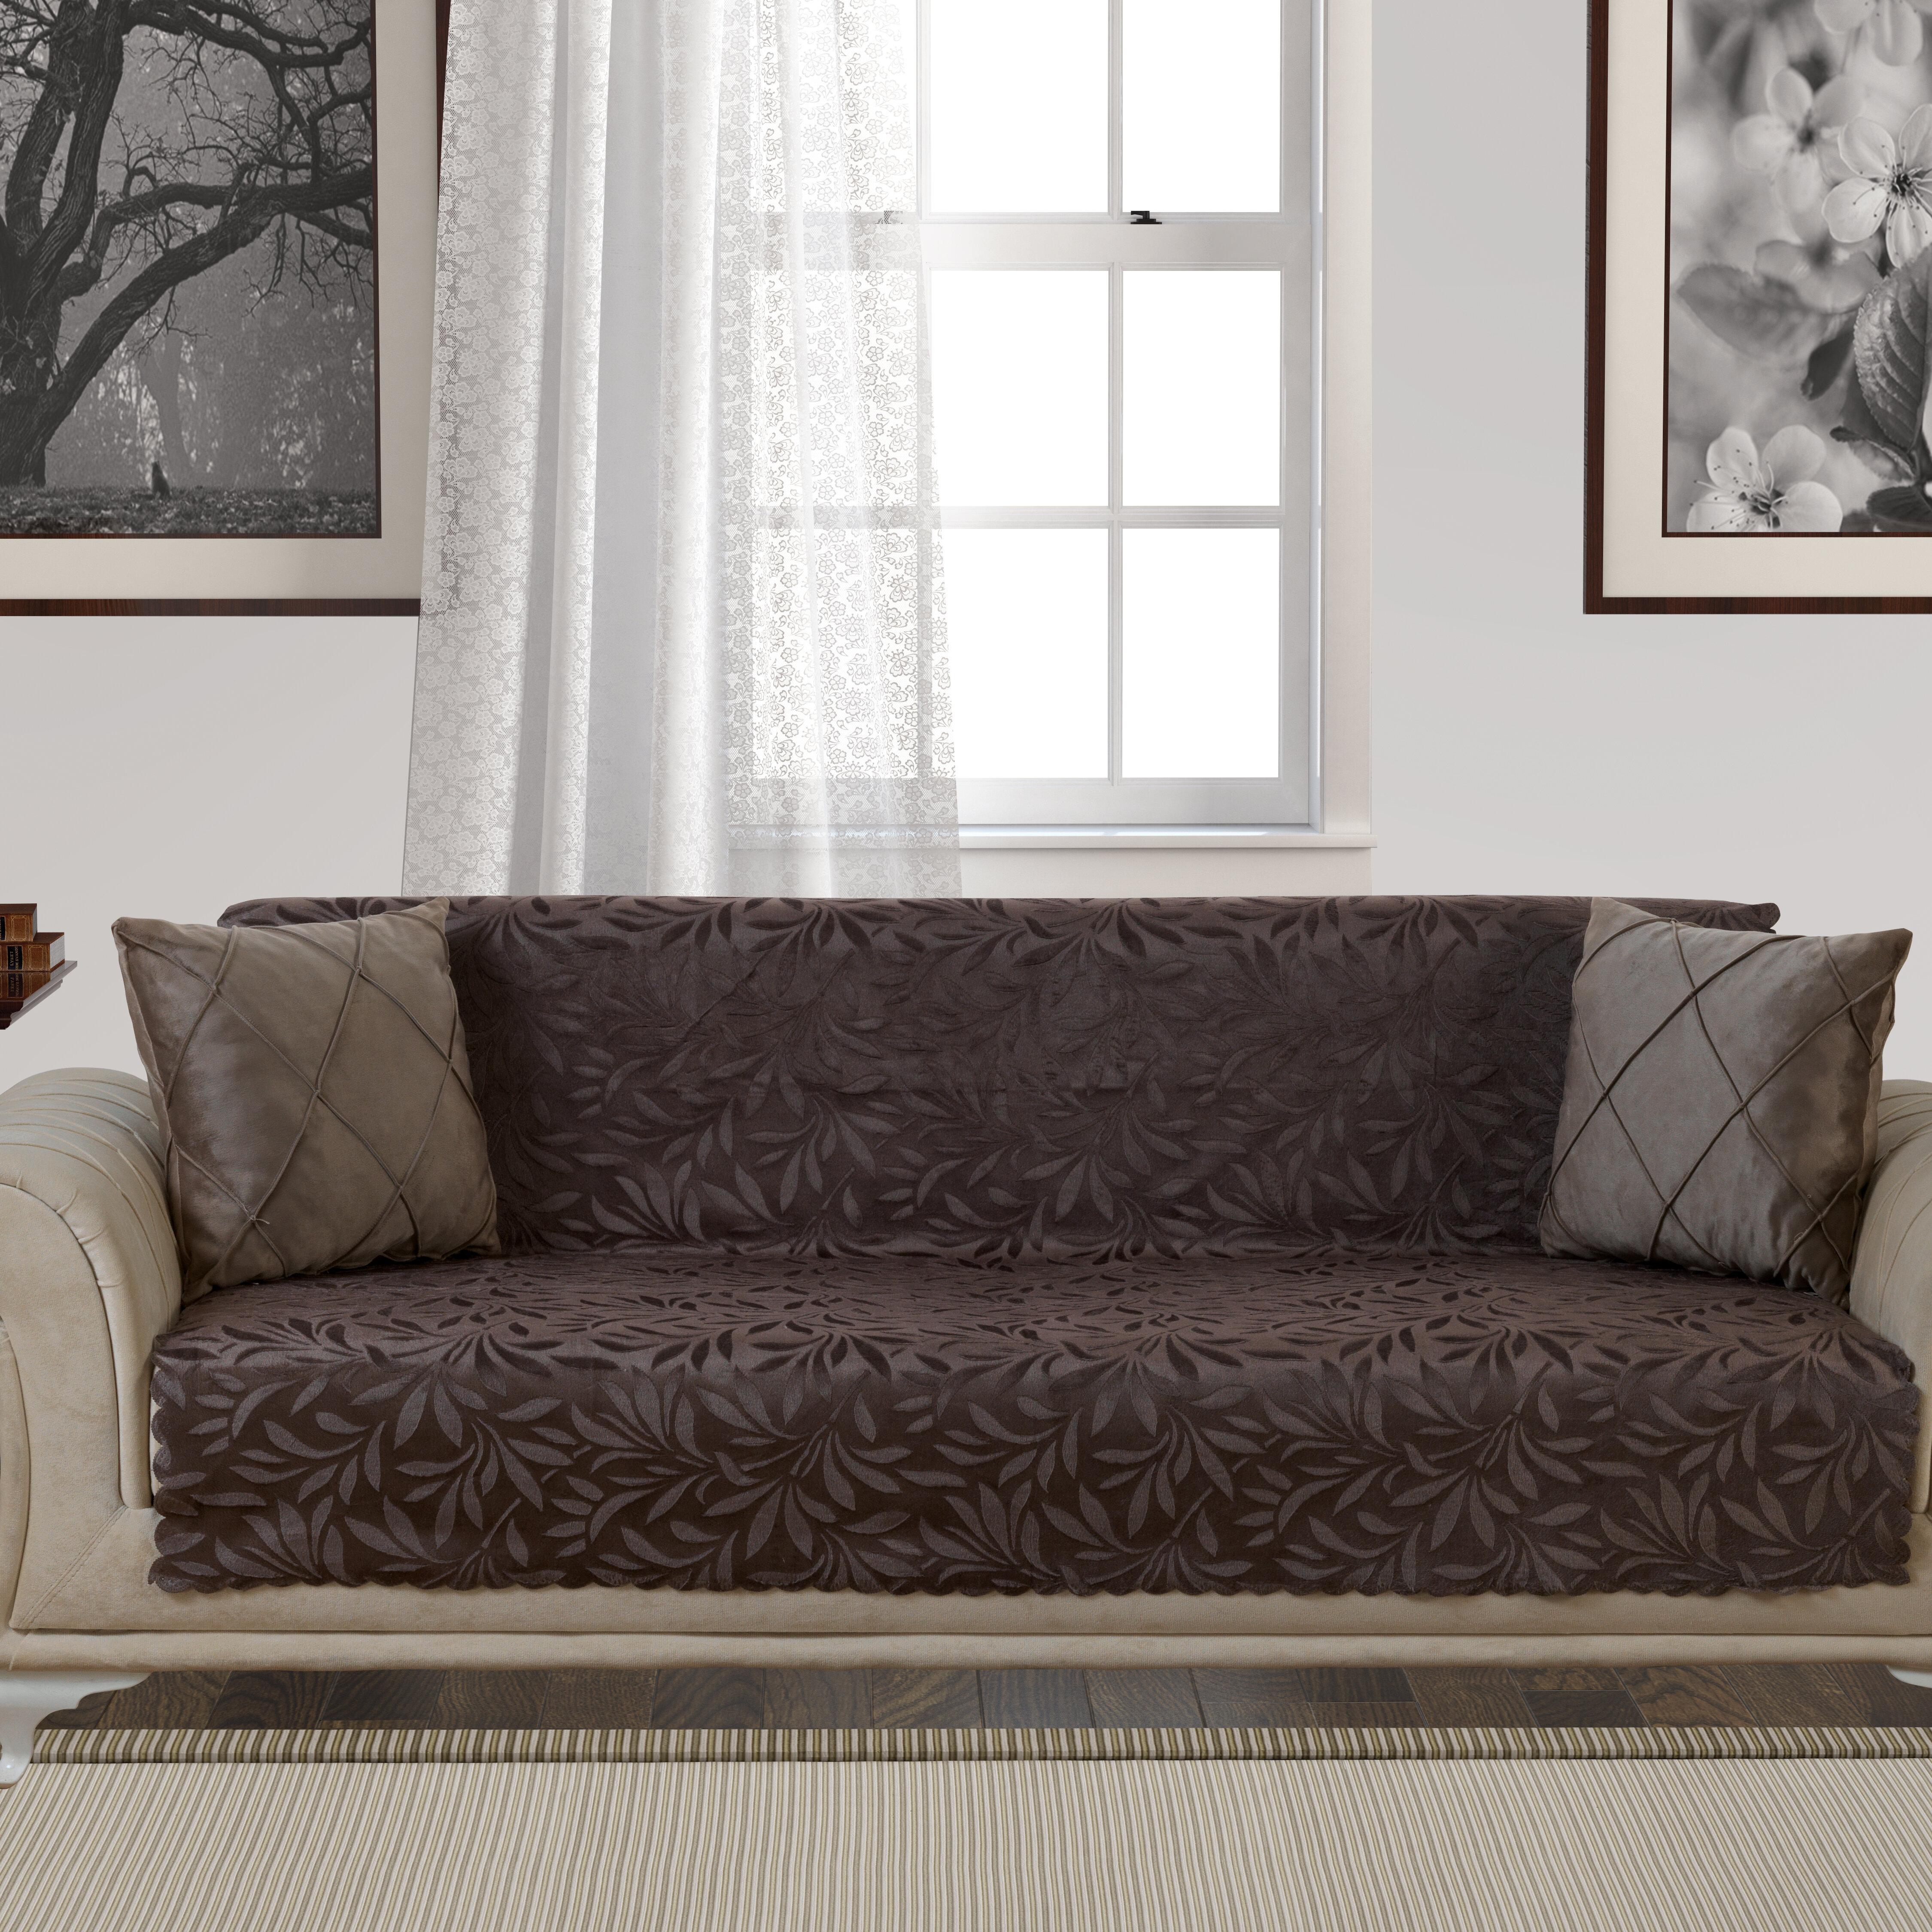 Red Barrel Studio Acacia Anti Slip Pet Furniture Protector Box T Cushion Sofa Slipcover Reviews Wayfair